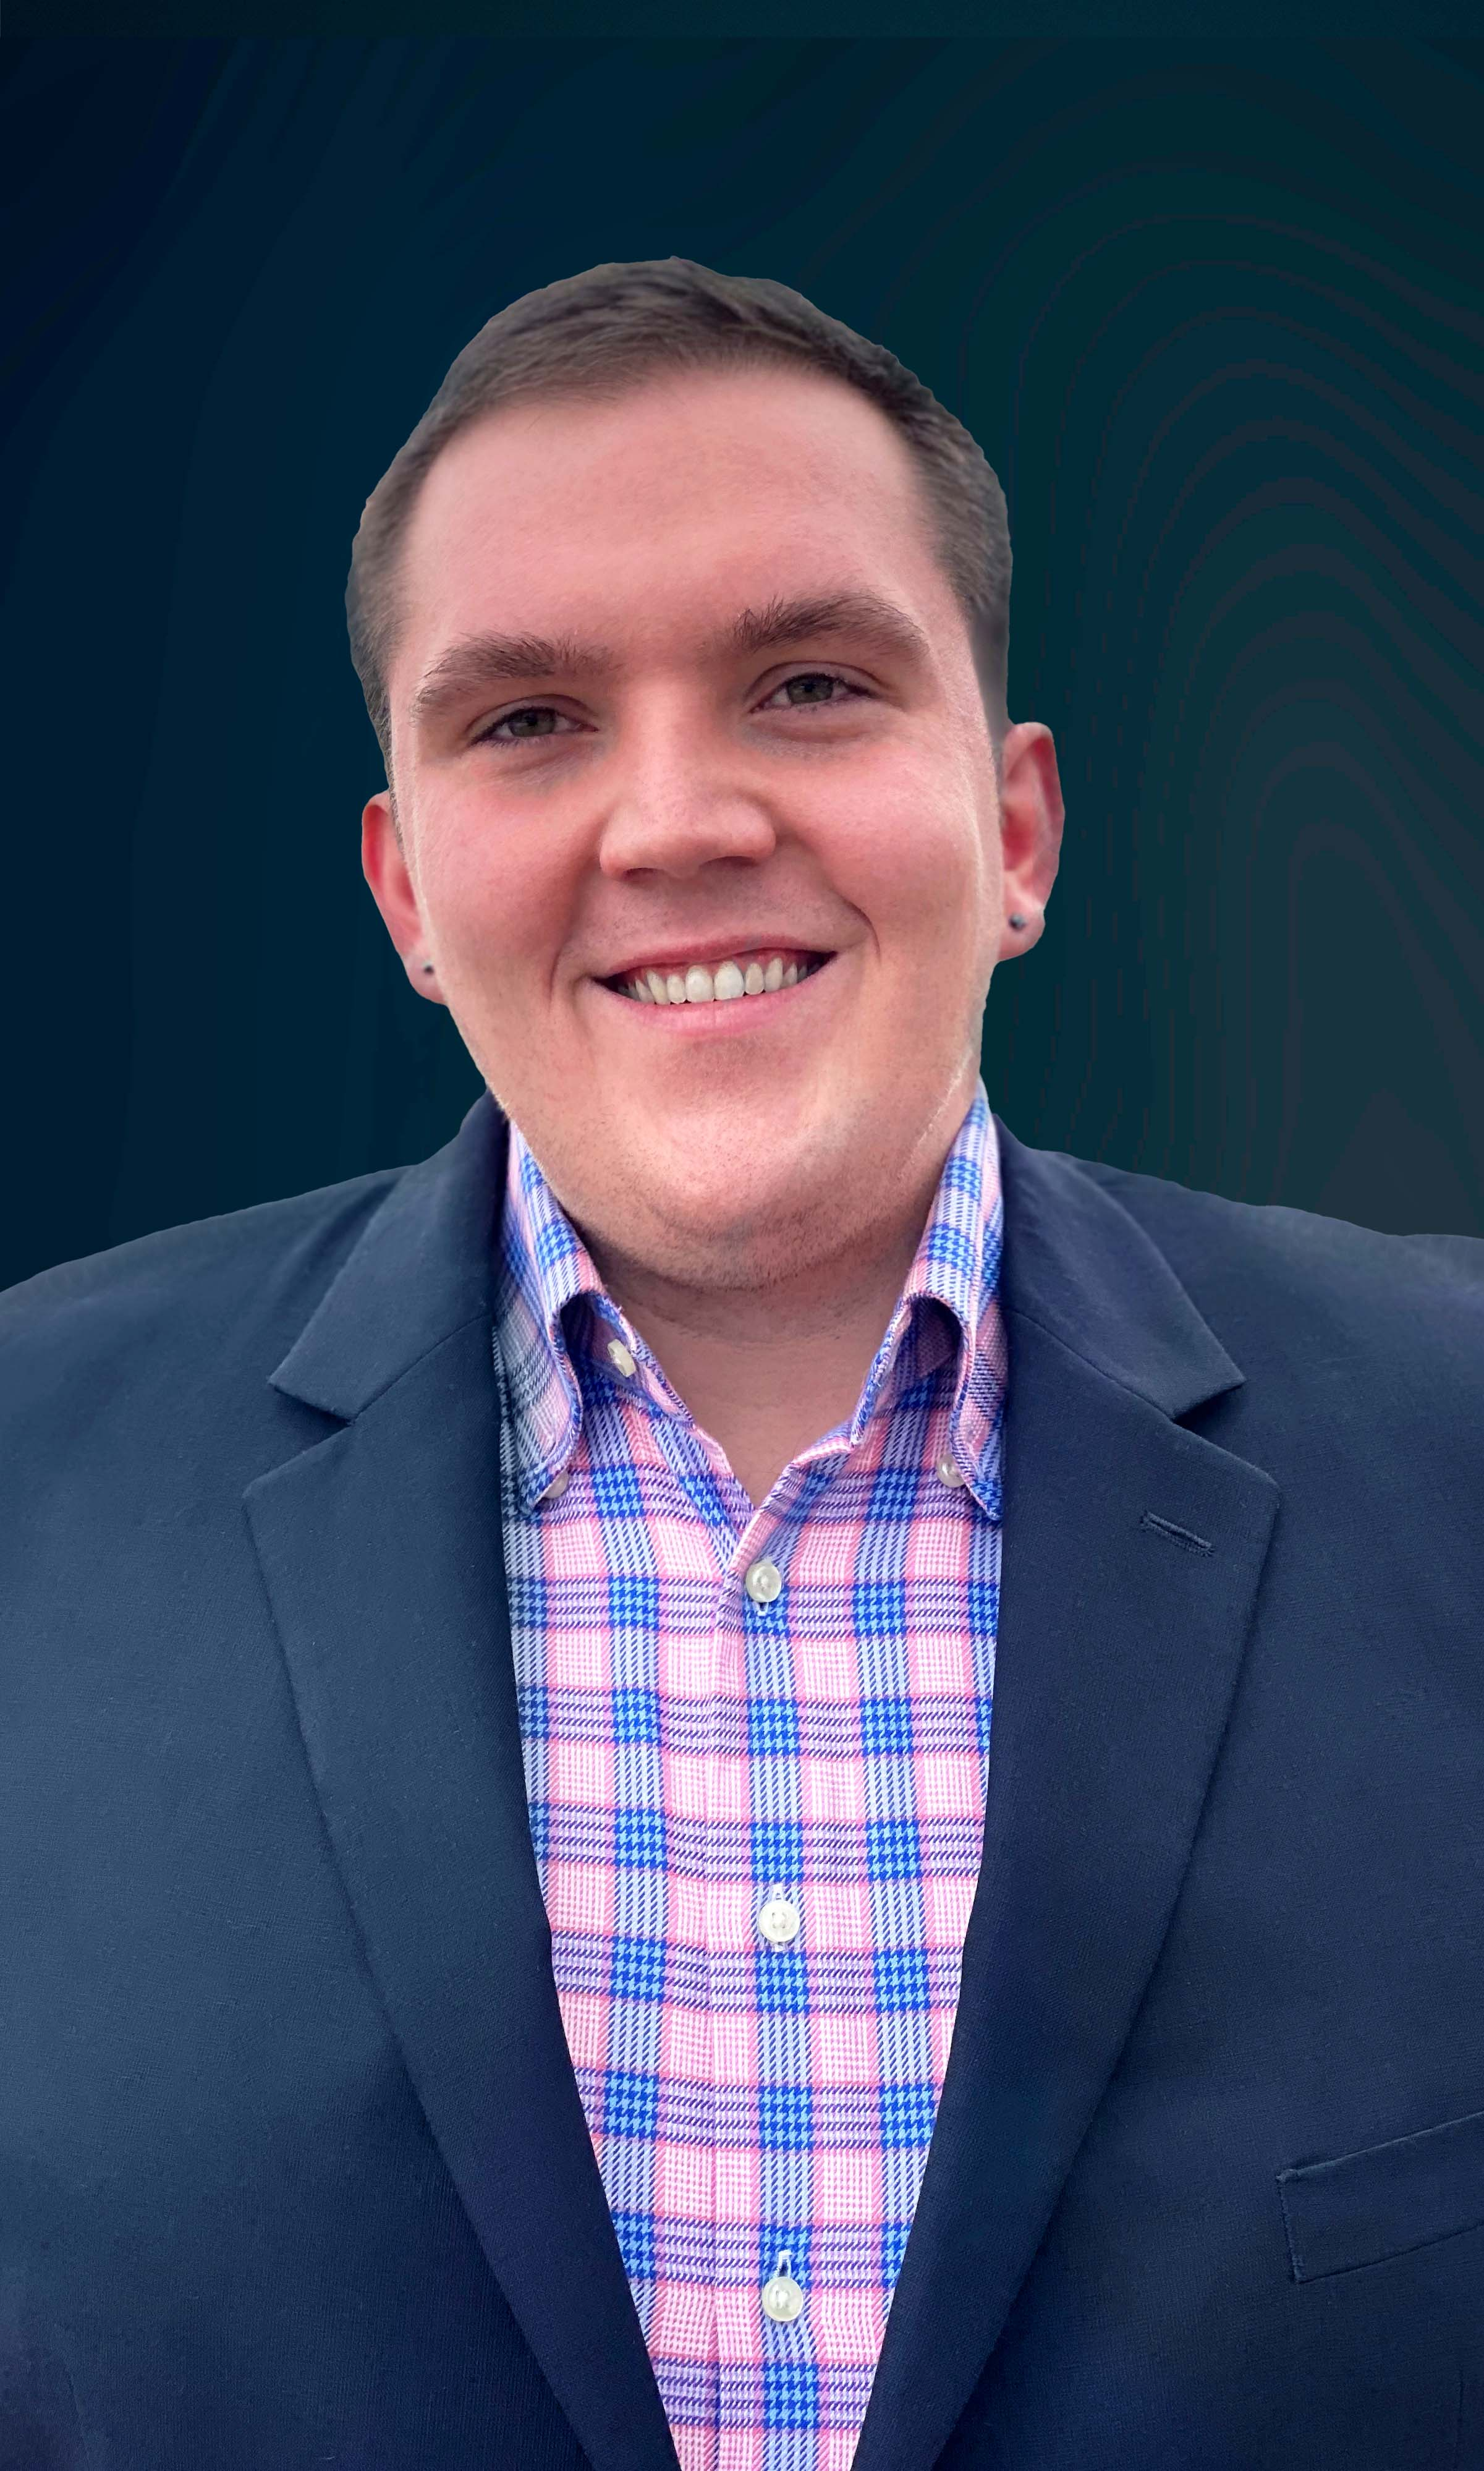 Kyle Cavanaugh Headshot